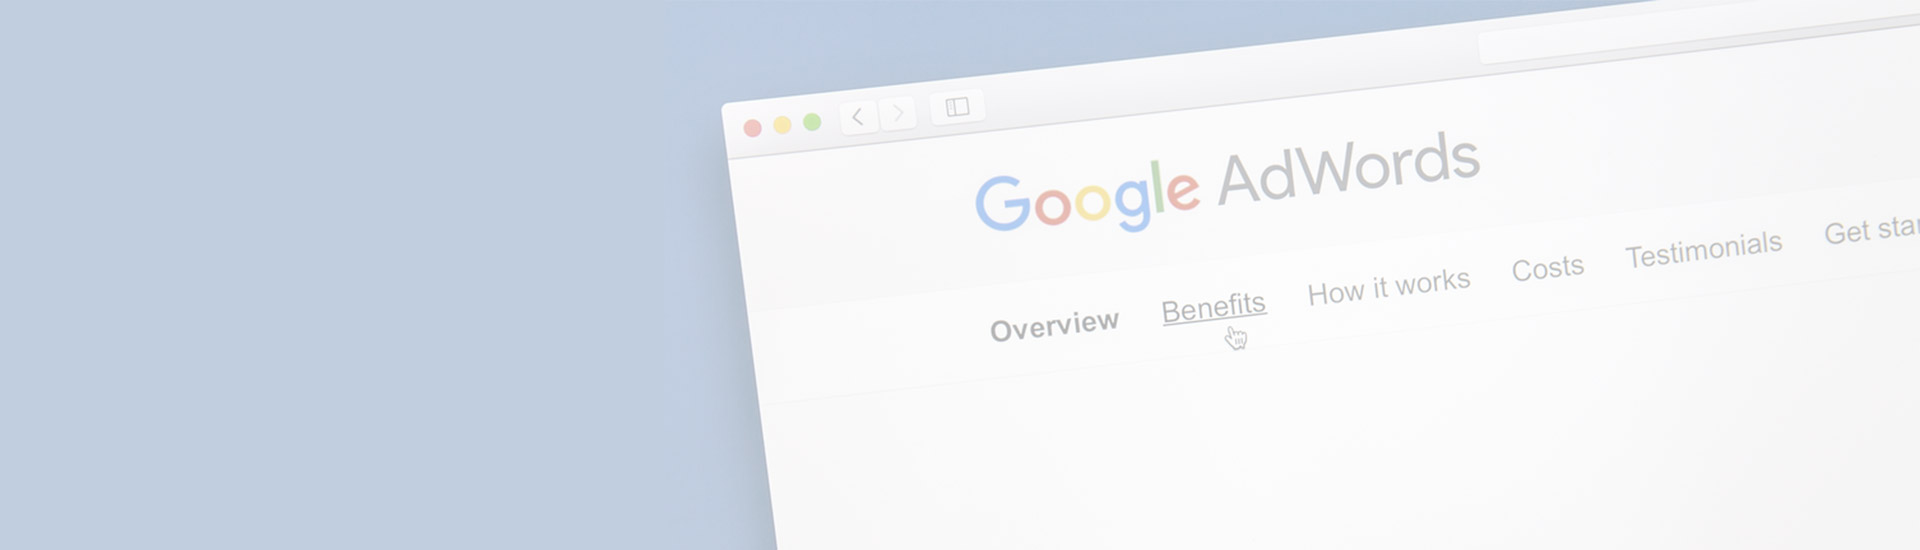 H Google καταργεί τις διαφημίσεις της δεξιάς στήλης